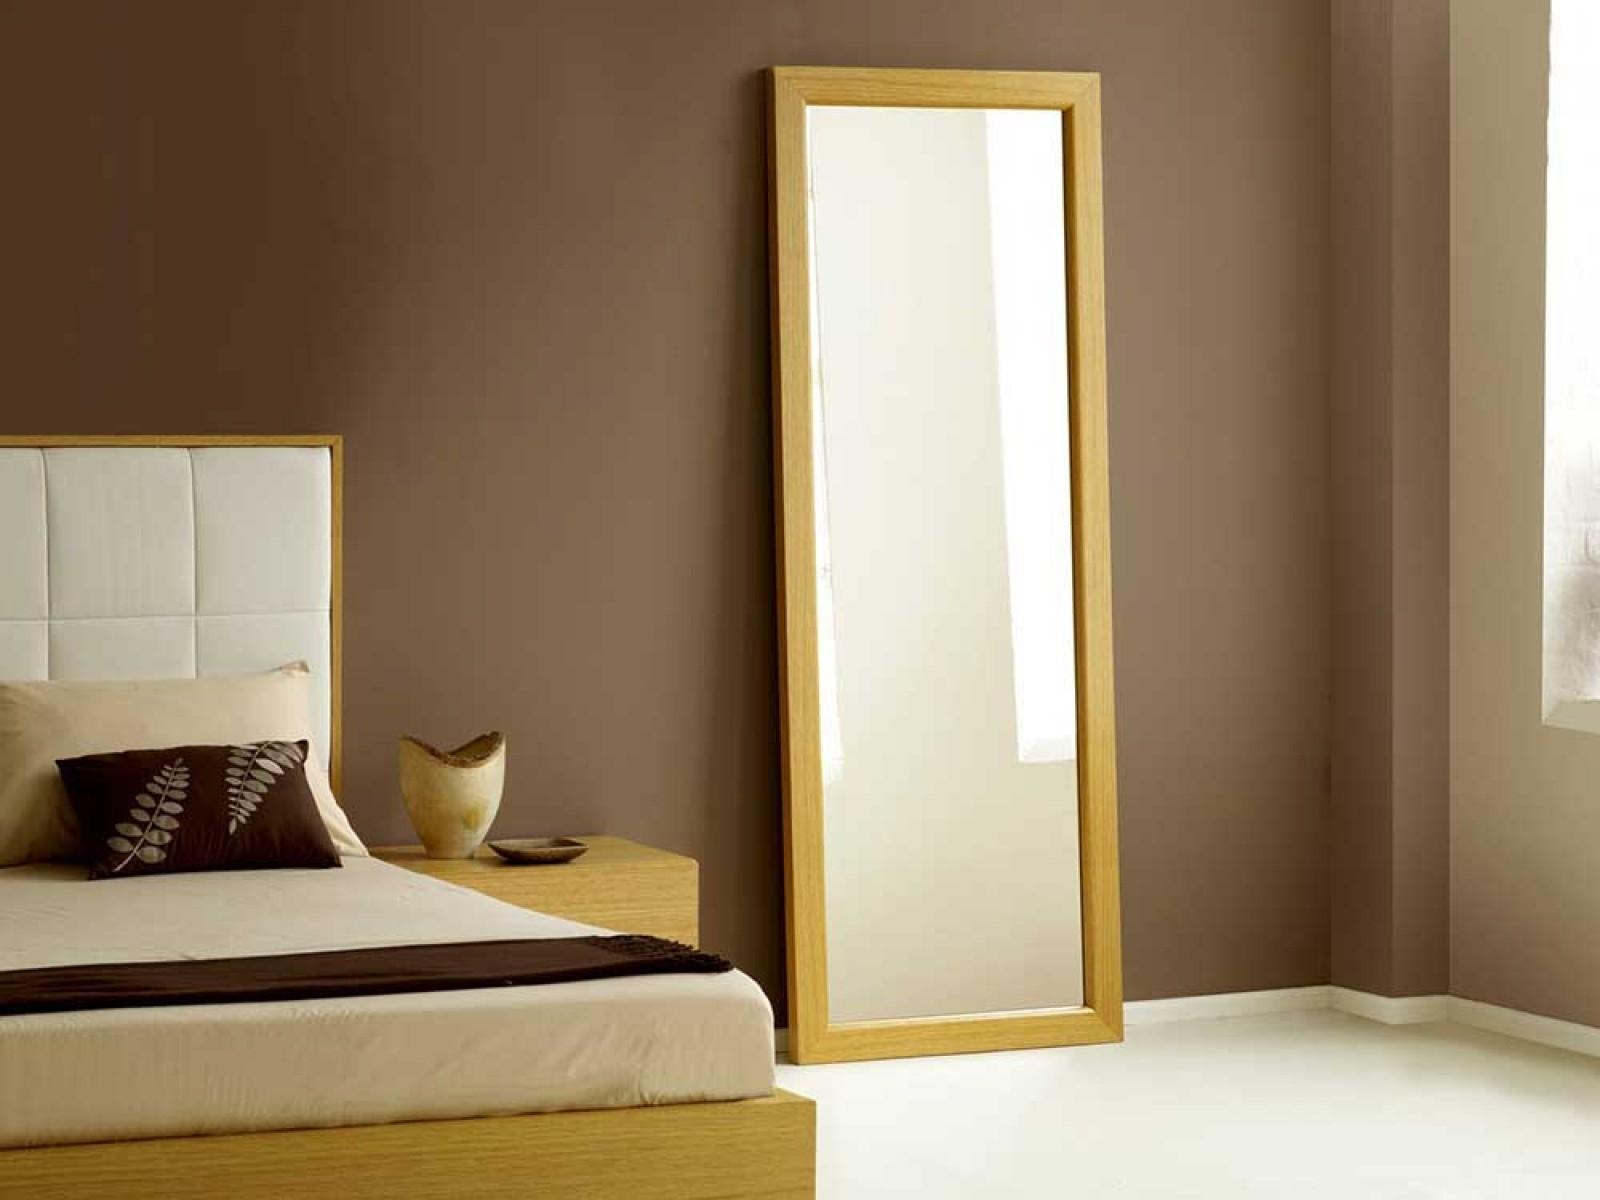 Flooring Decorative Full Length Wall Mirror Tonyswadenalocker In Oak Mirrors For Sale (Image 7 of 15)